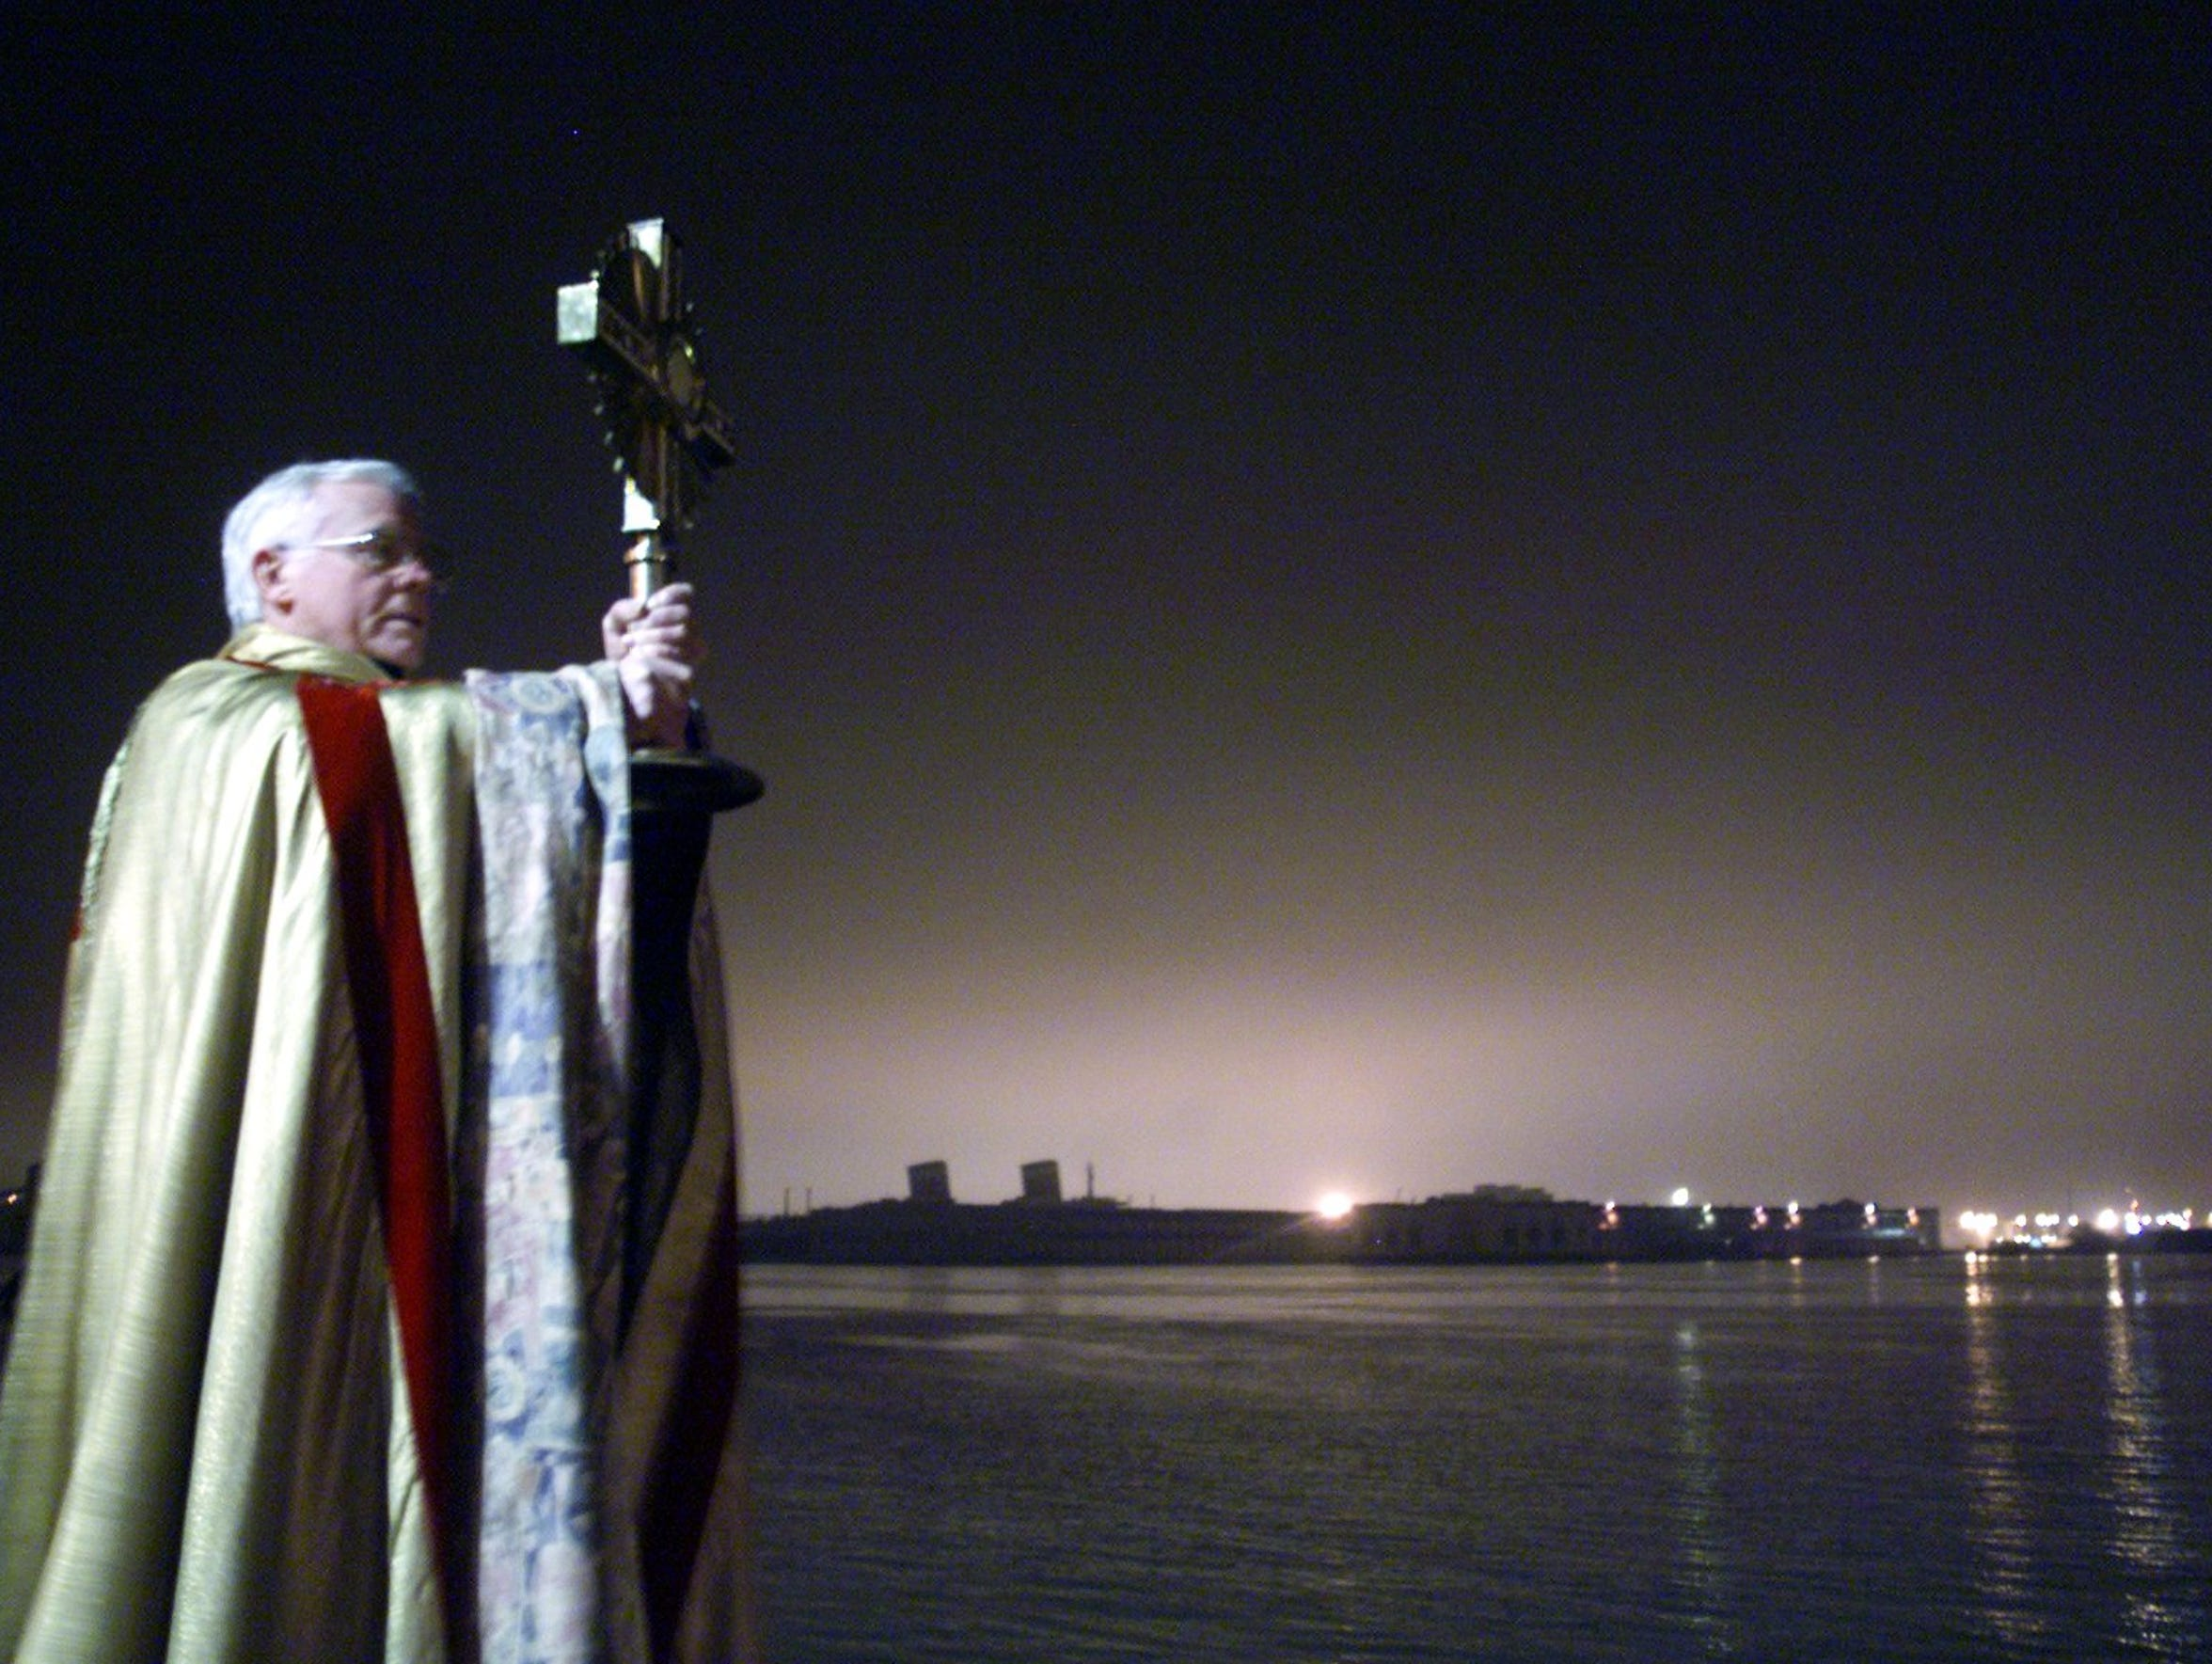 Monsignor Michael Doyle blesses the Delaware River